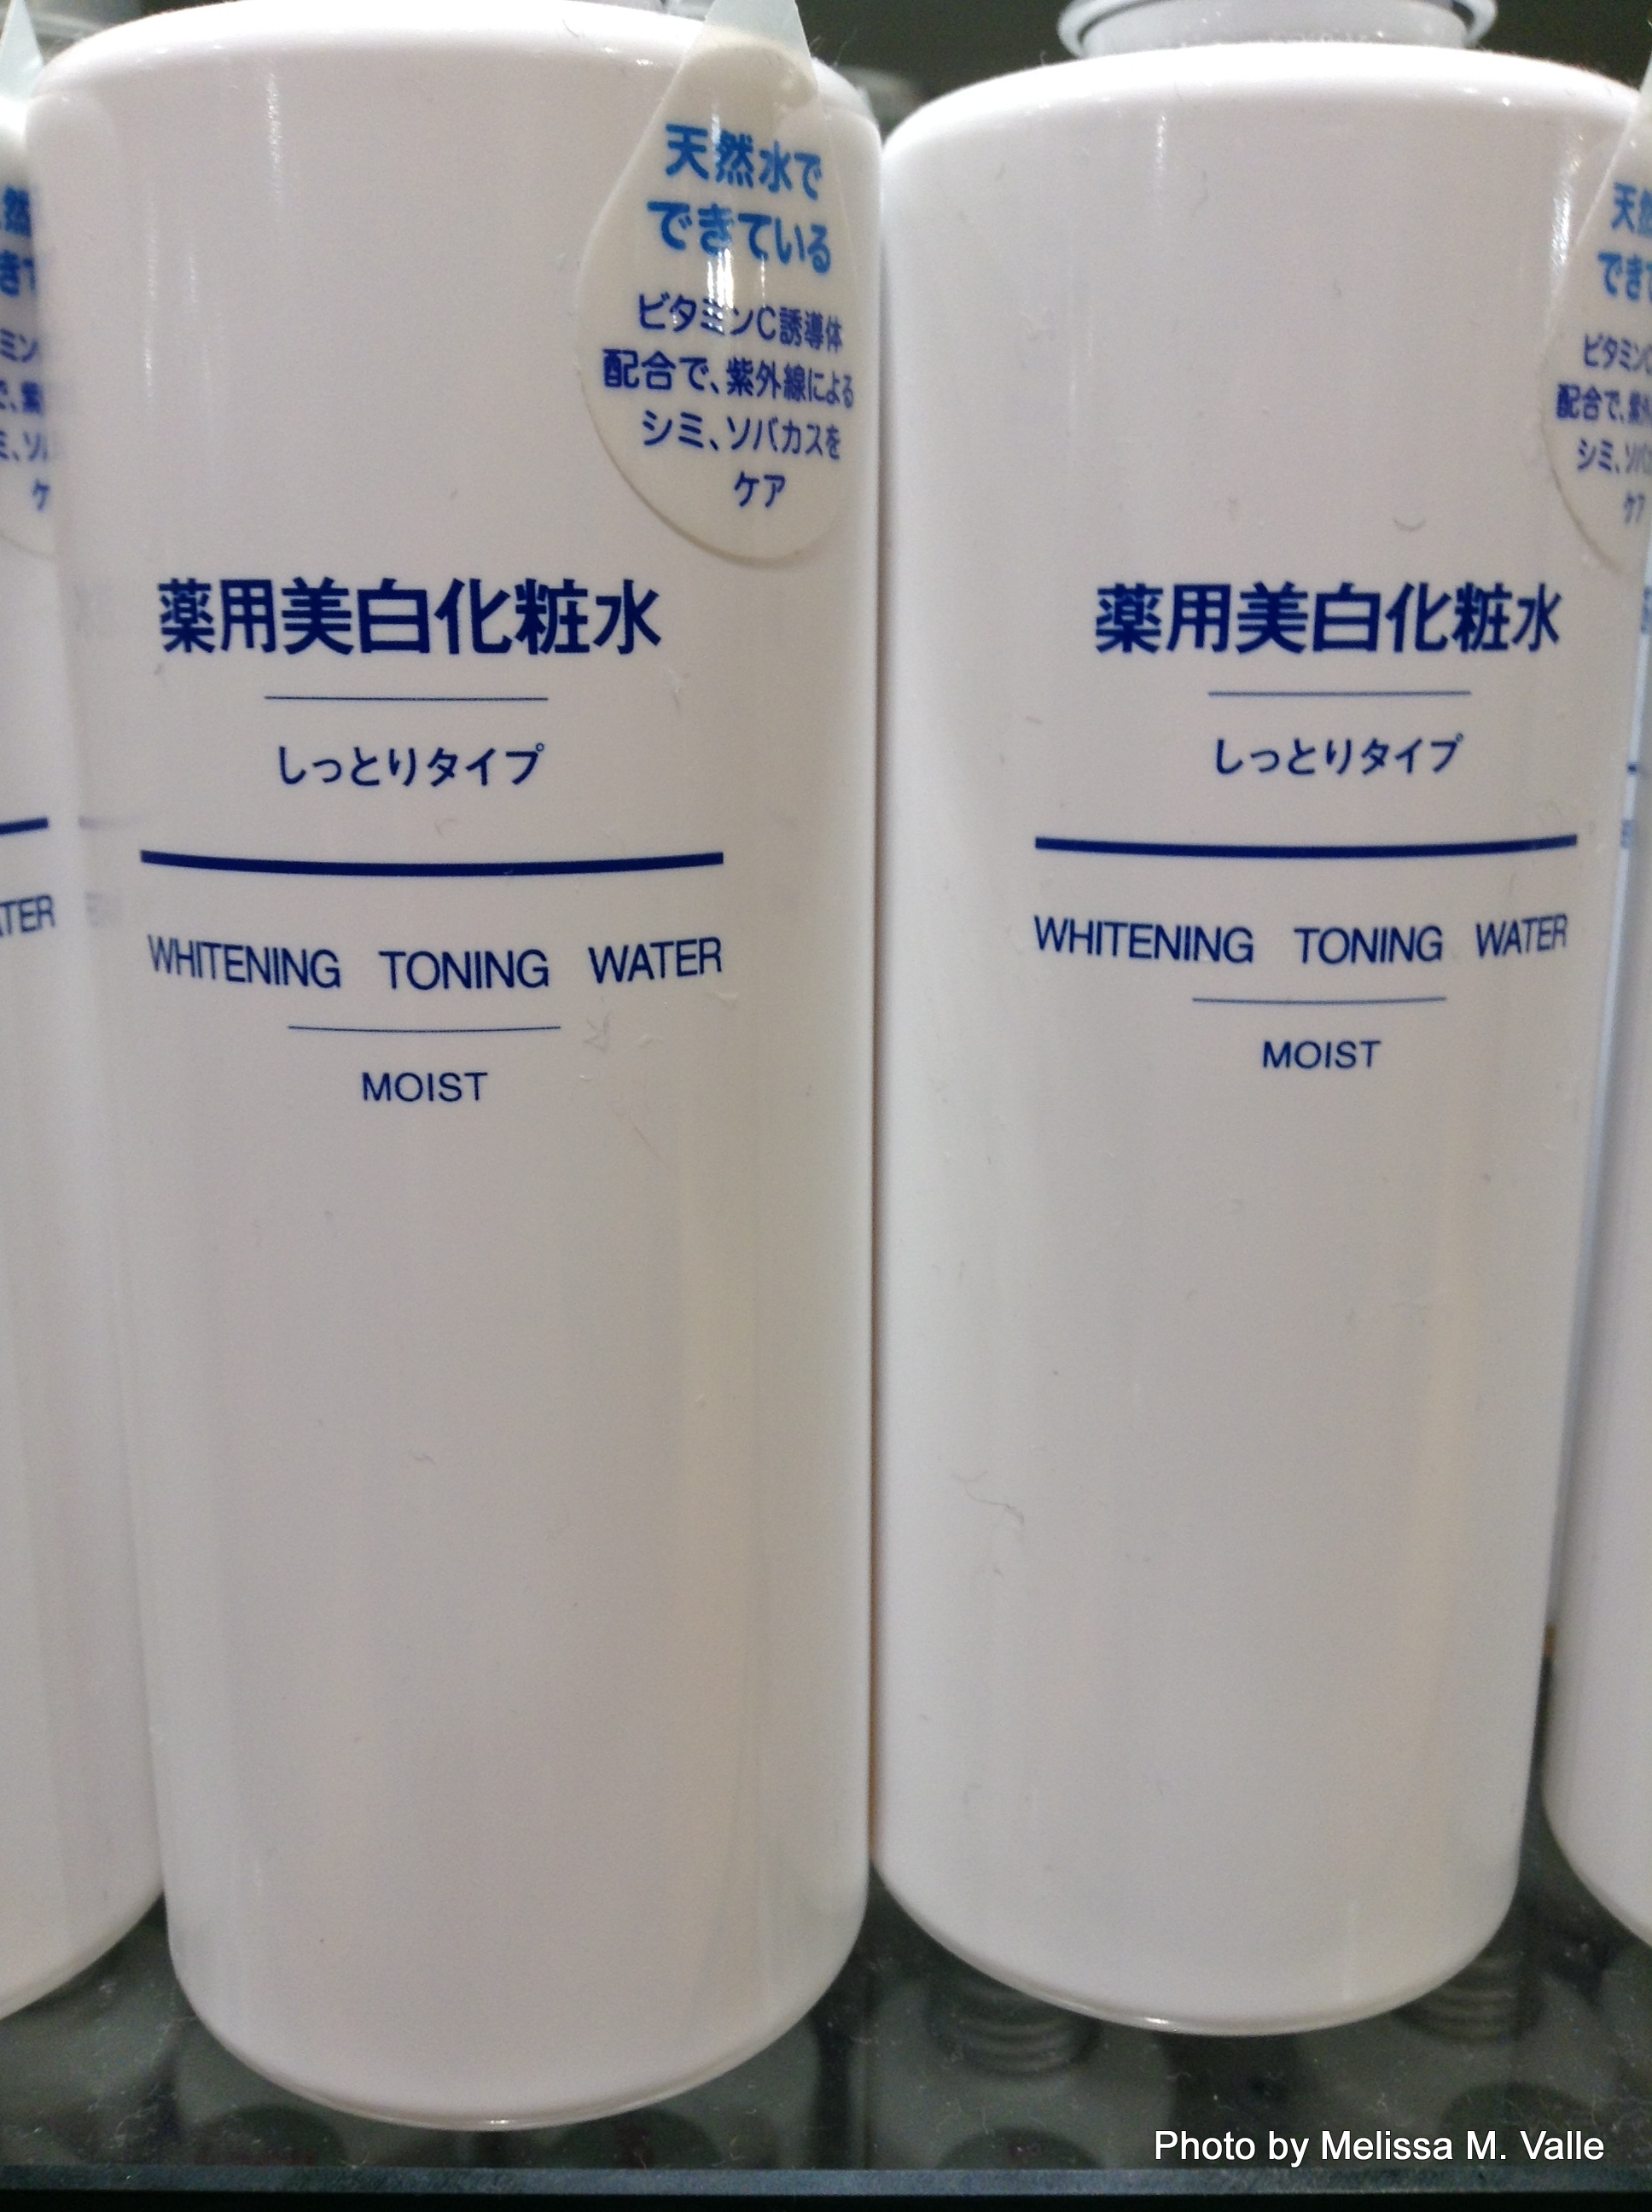 7.21.14 Tokyo, Japan- Ginza, Muji whitening products (2).JPG